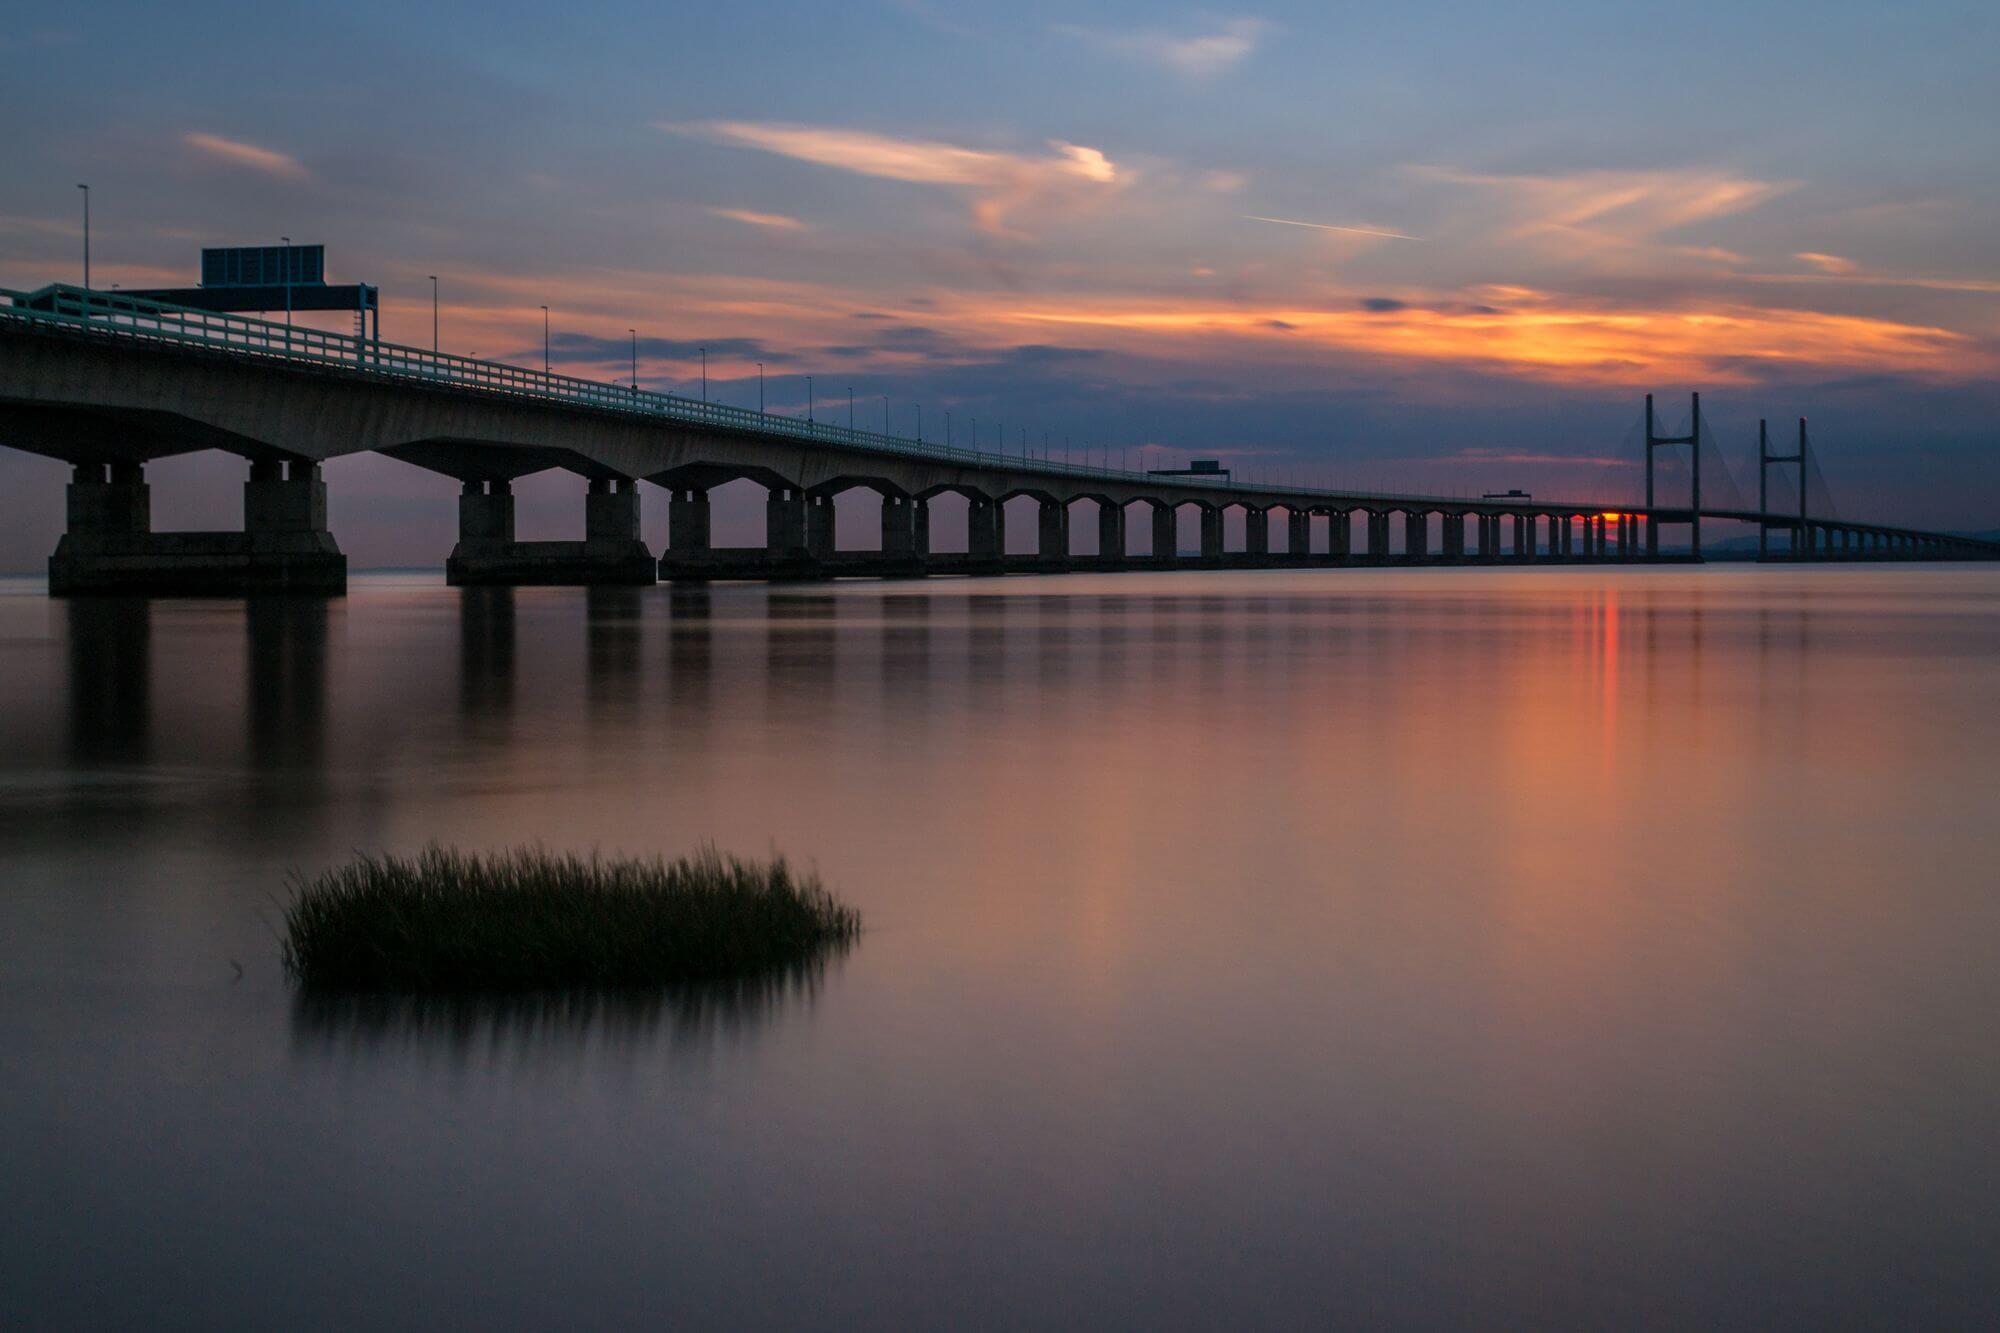 Severn Crossing Sunset